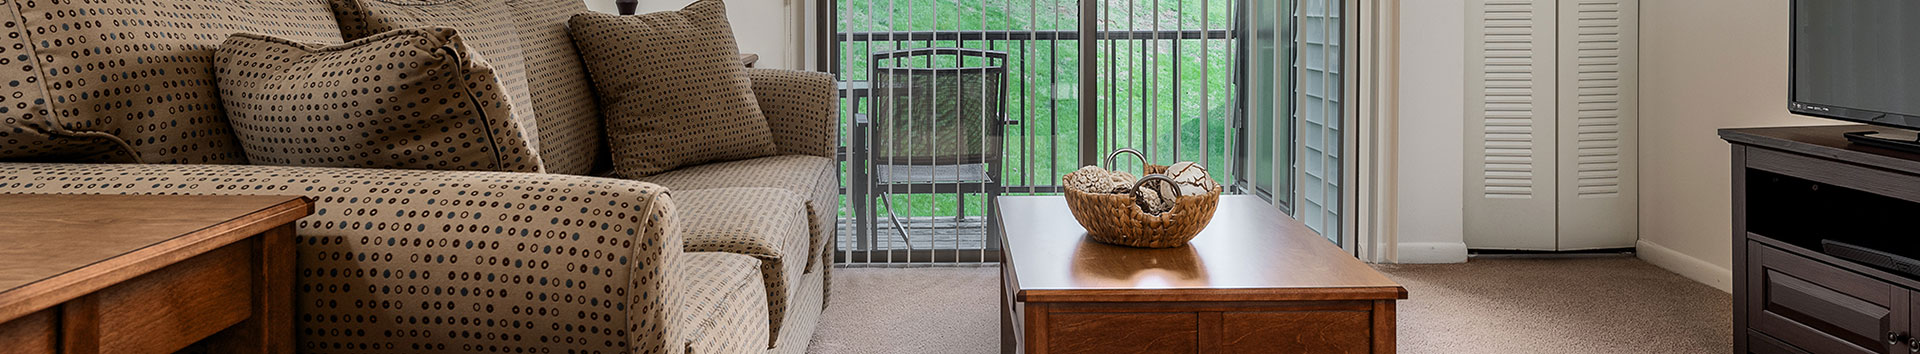 Room Interior of Powder Mill Apartments at Manor Communities, York/Pennsylvania